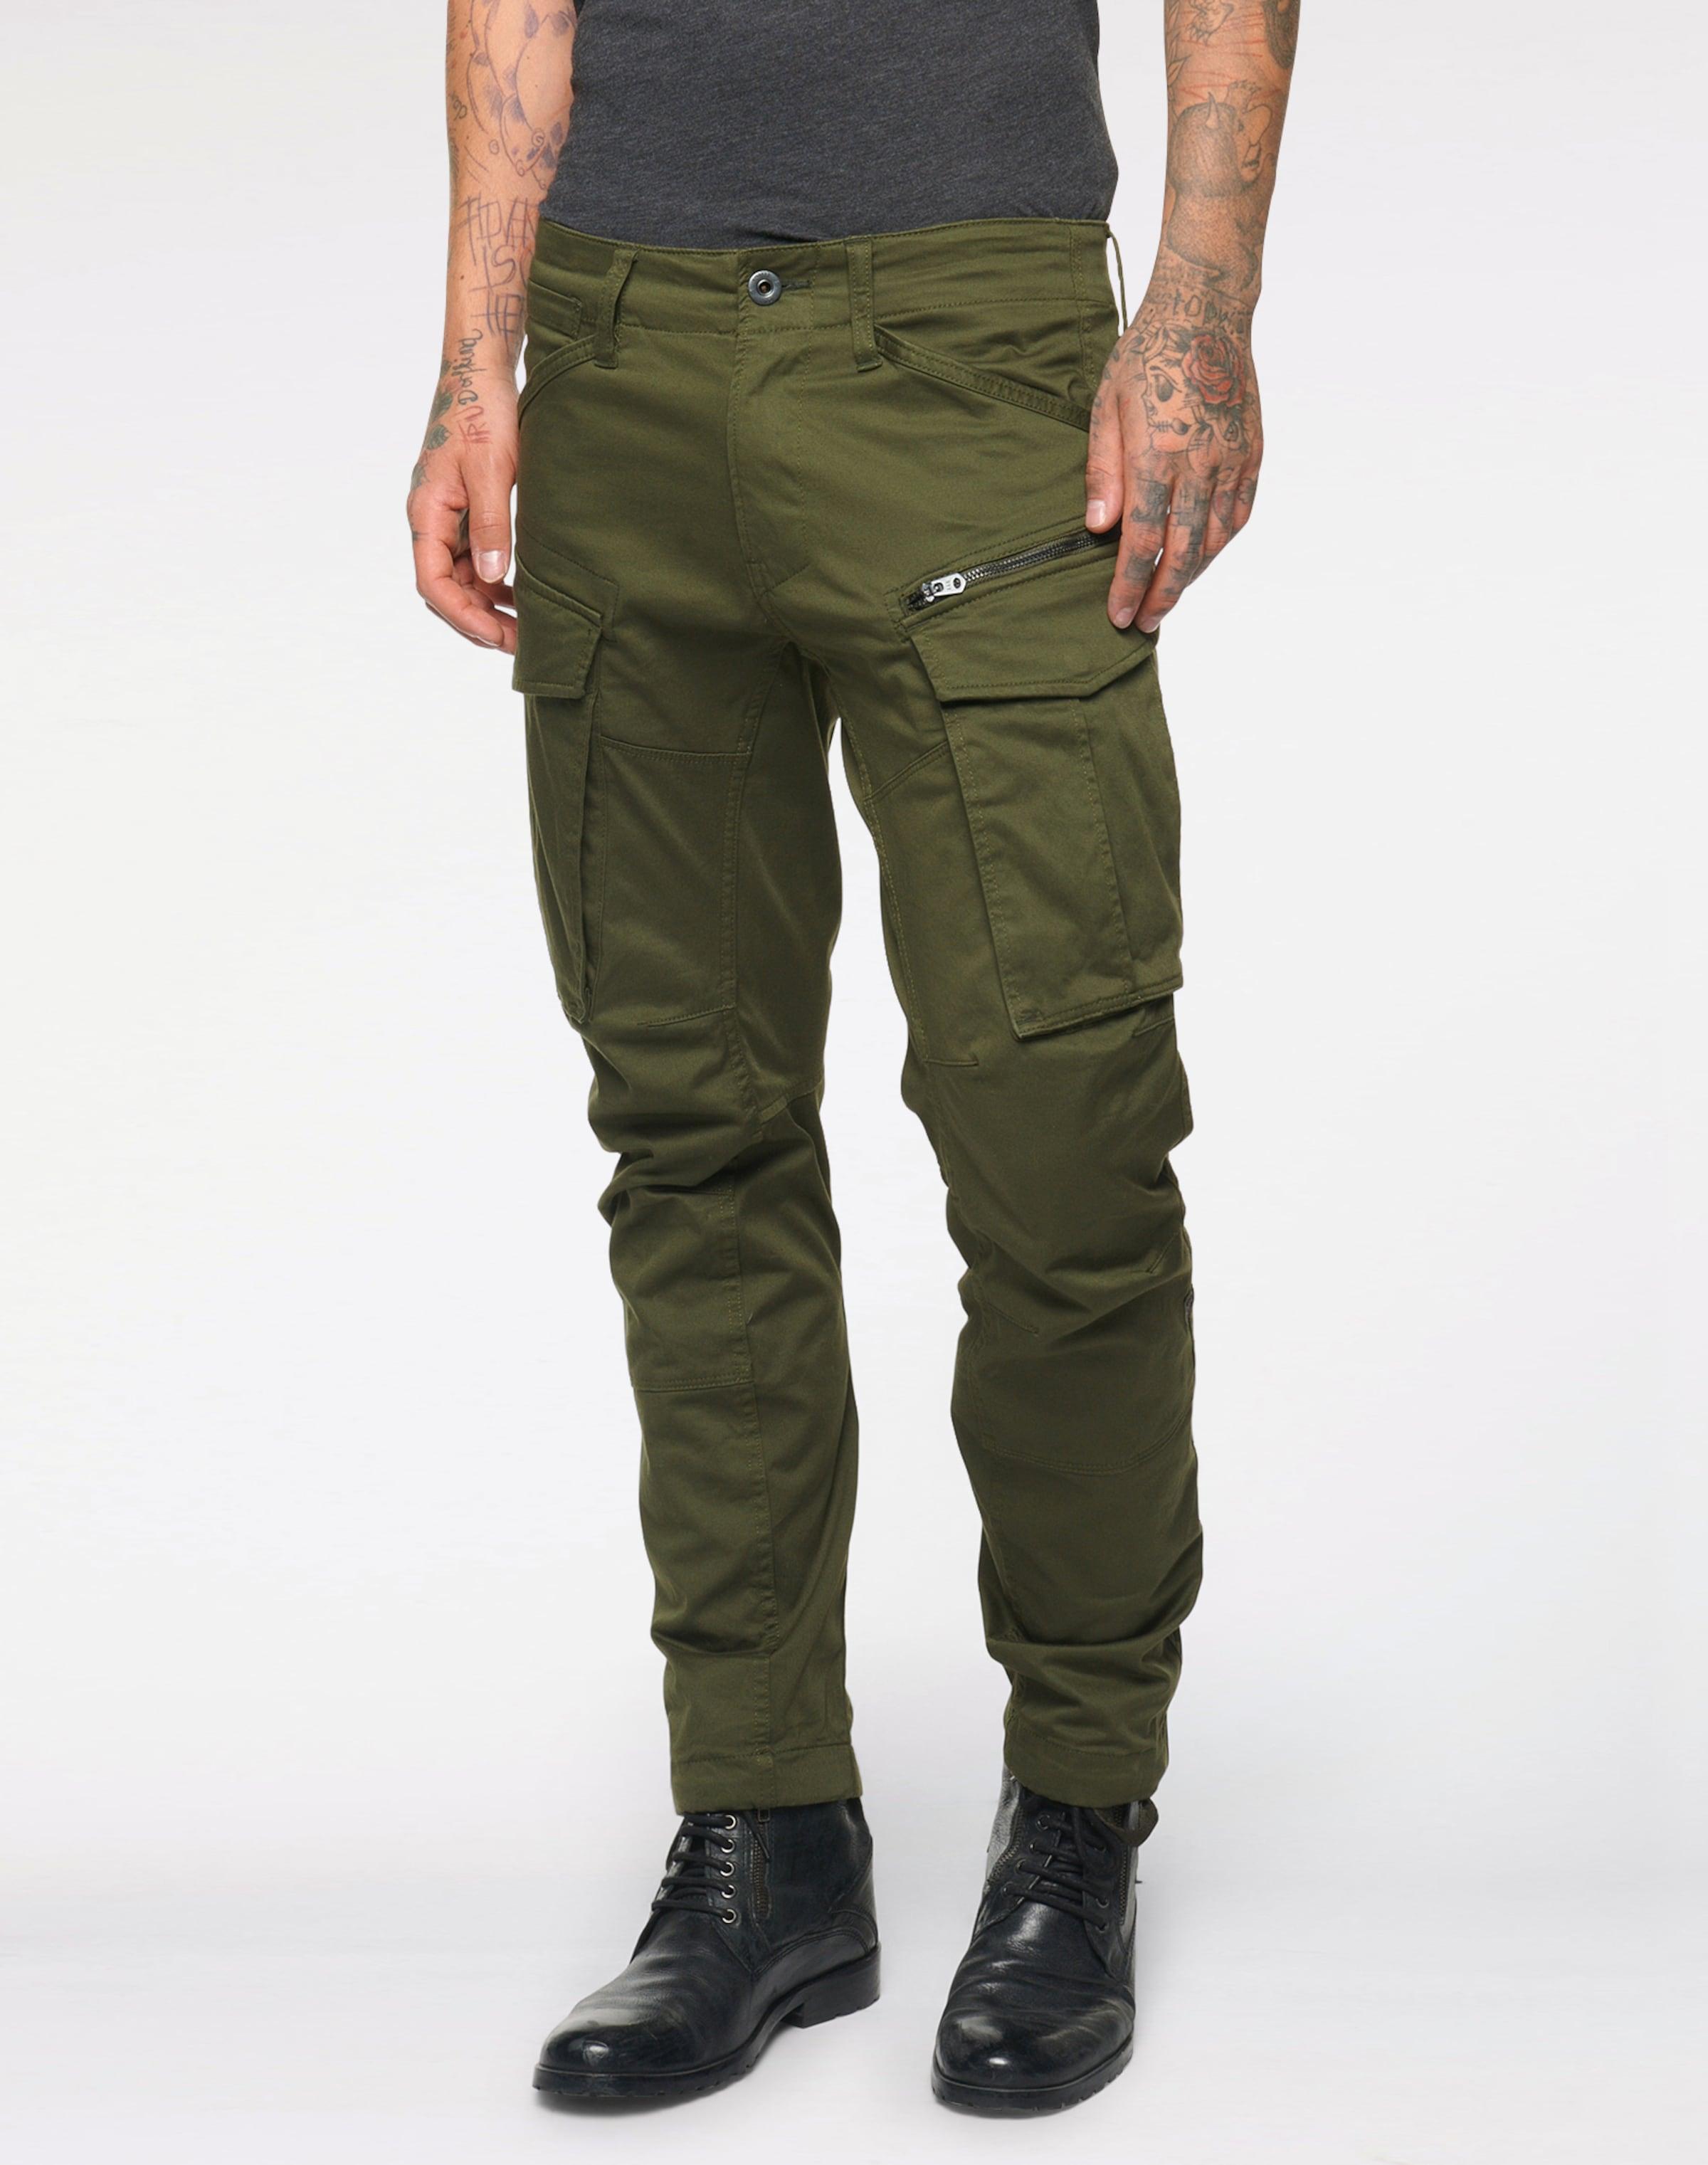 Bleu star G 3d Tapered' En Foncé Pantalon Raw Cargo 'rovic nmN8v0w